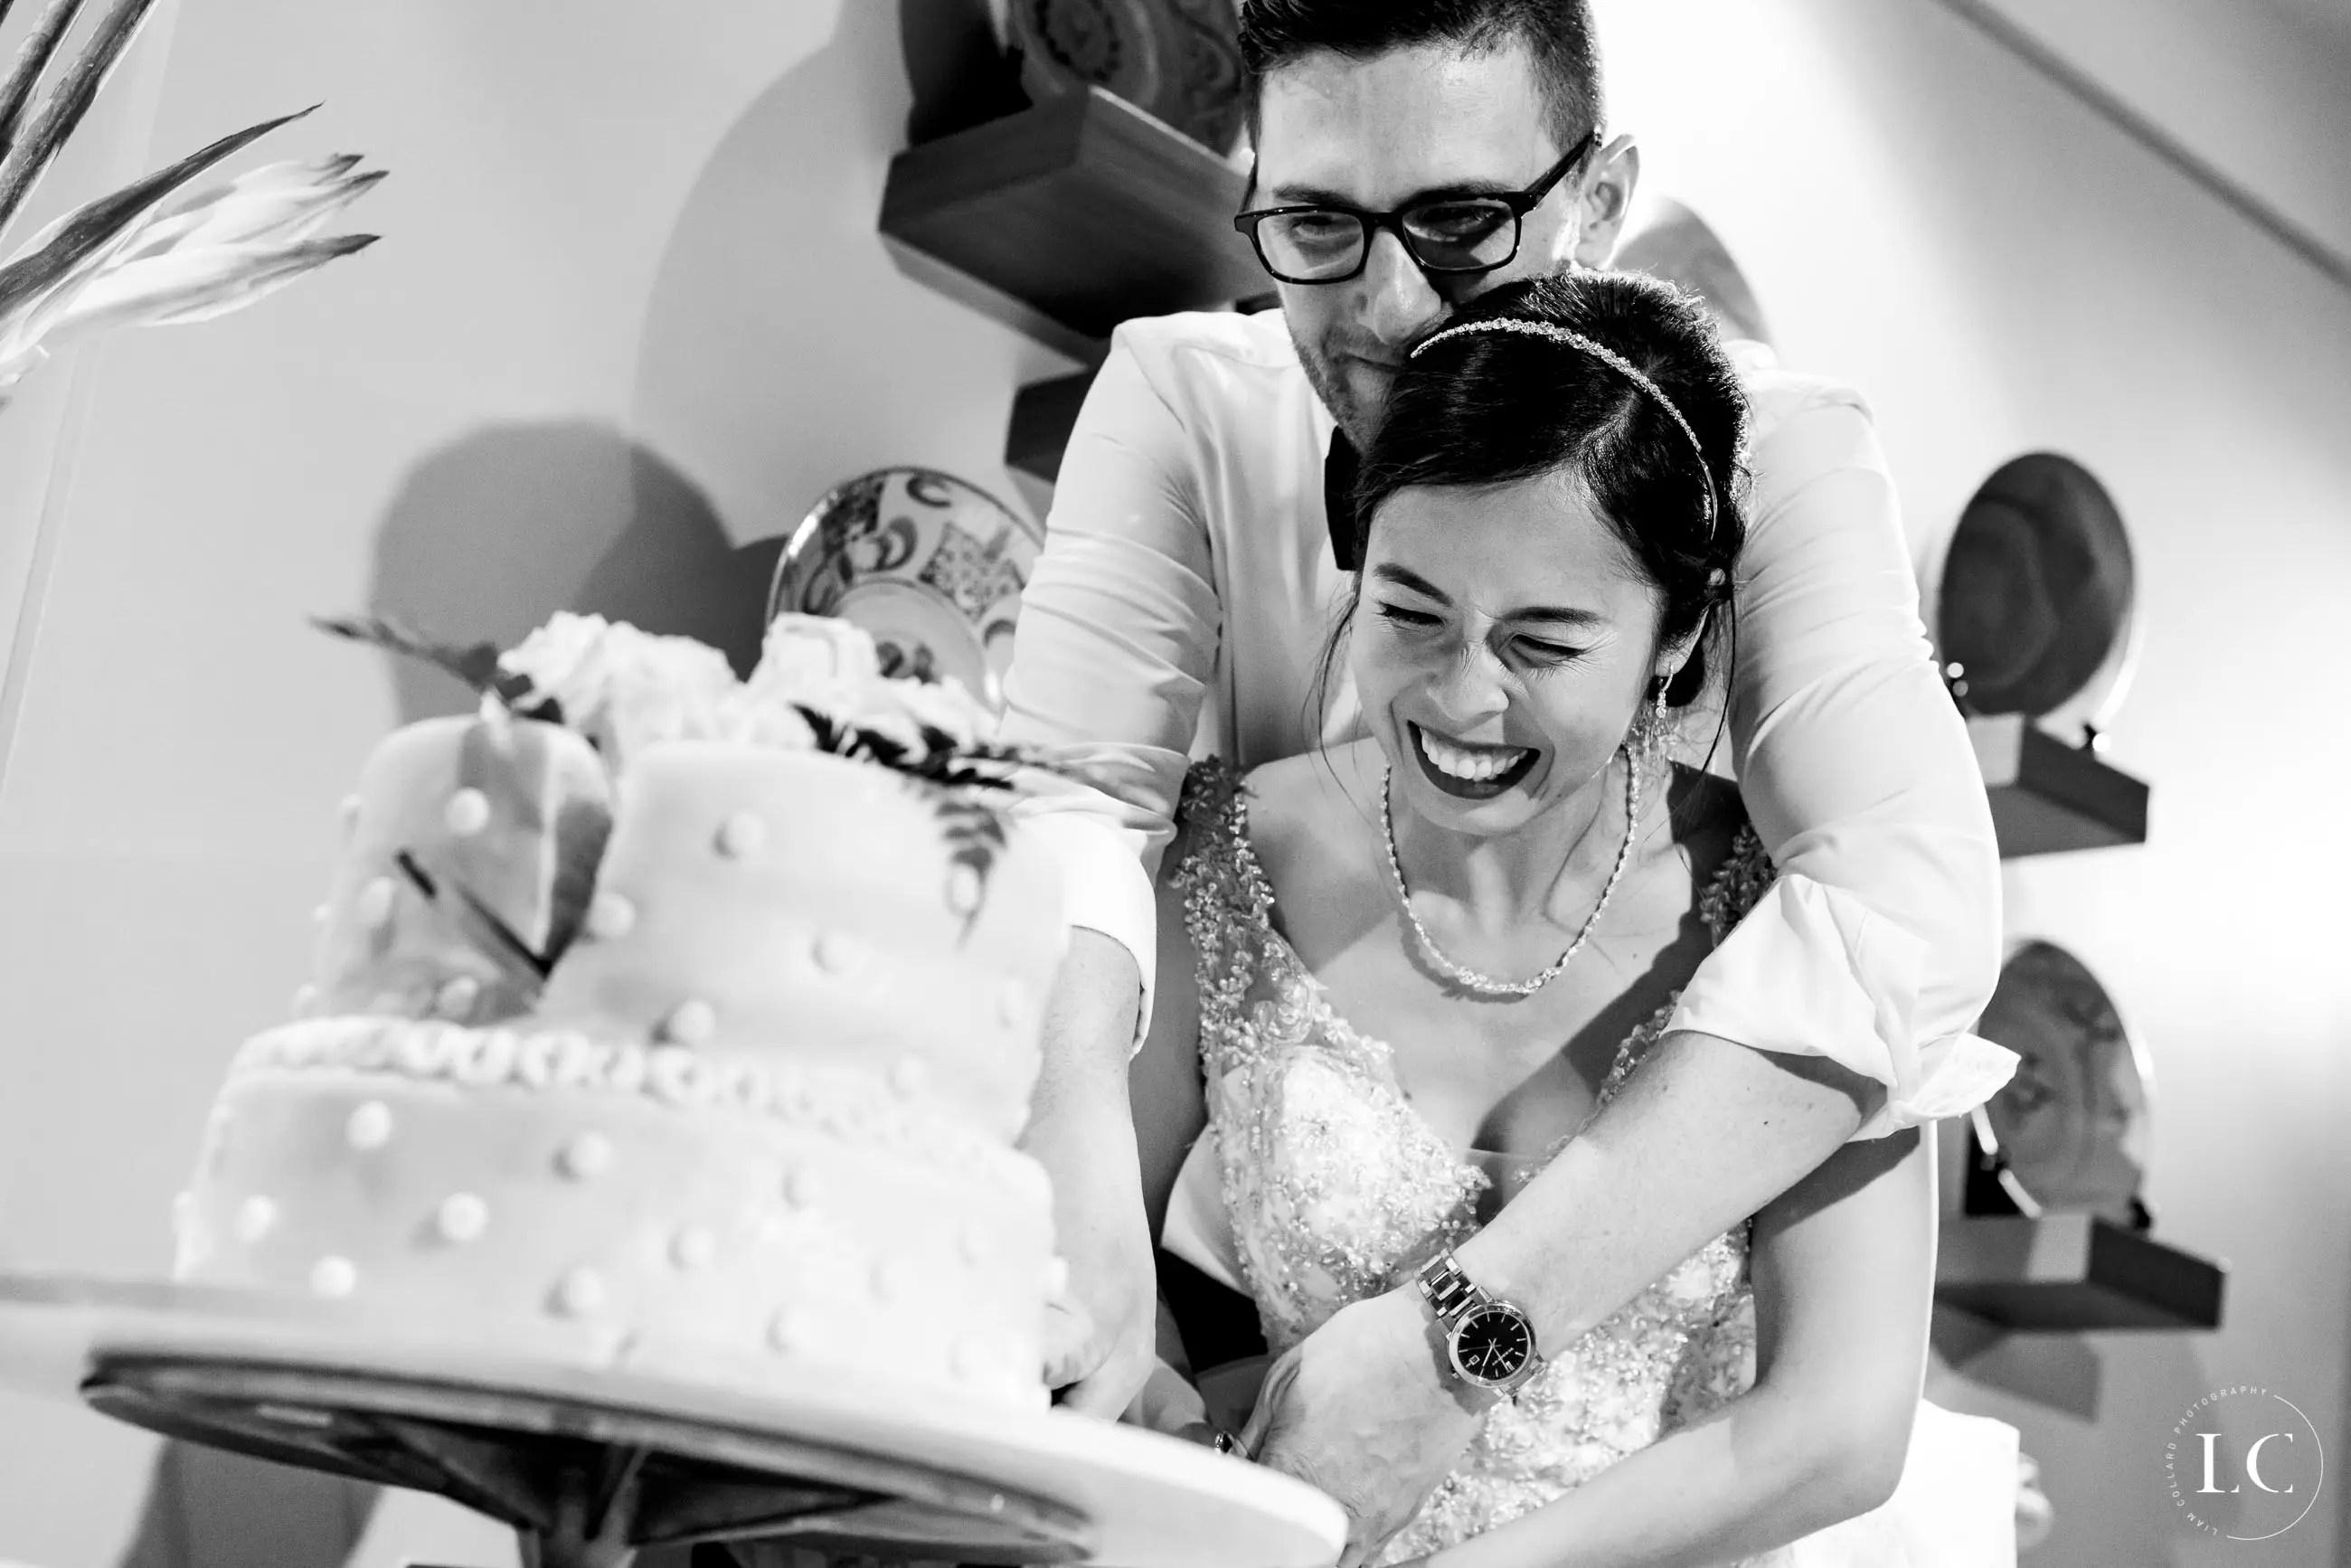 Newly weds cut the wedding cake